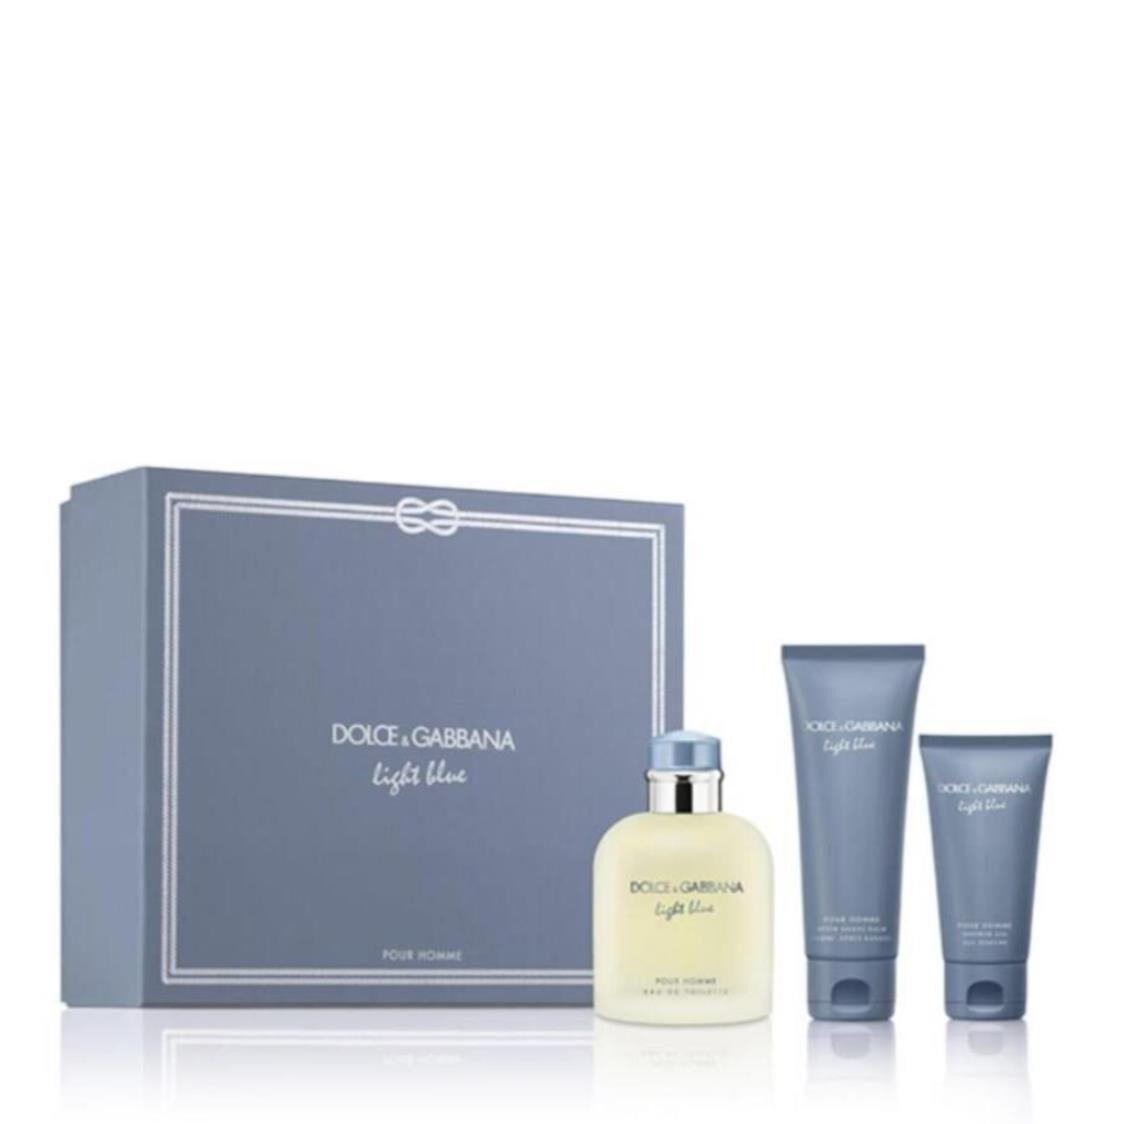 Dolce  Gabbana Light Blue Pour Homme EDT 125ml Trio Gift Set